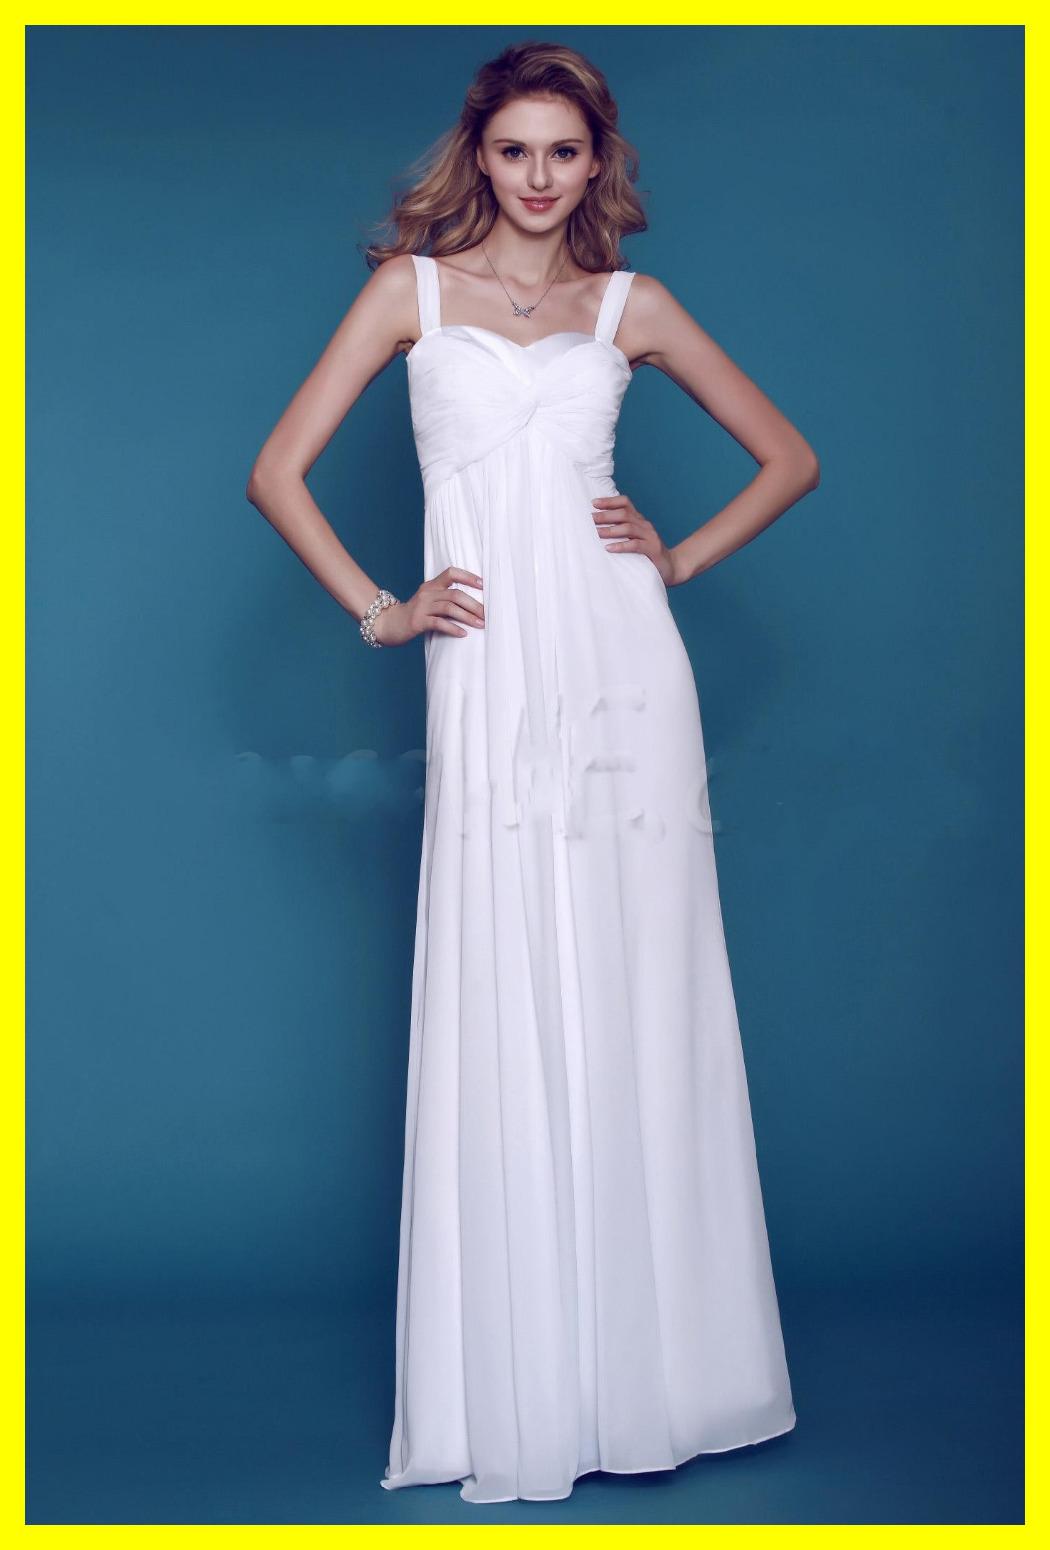 yellow prom dresses dress patterns blue uk maxi a line. Black Bedroom Furniture Sets. Home Design Ideas